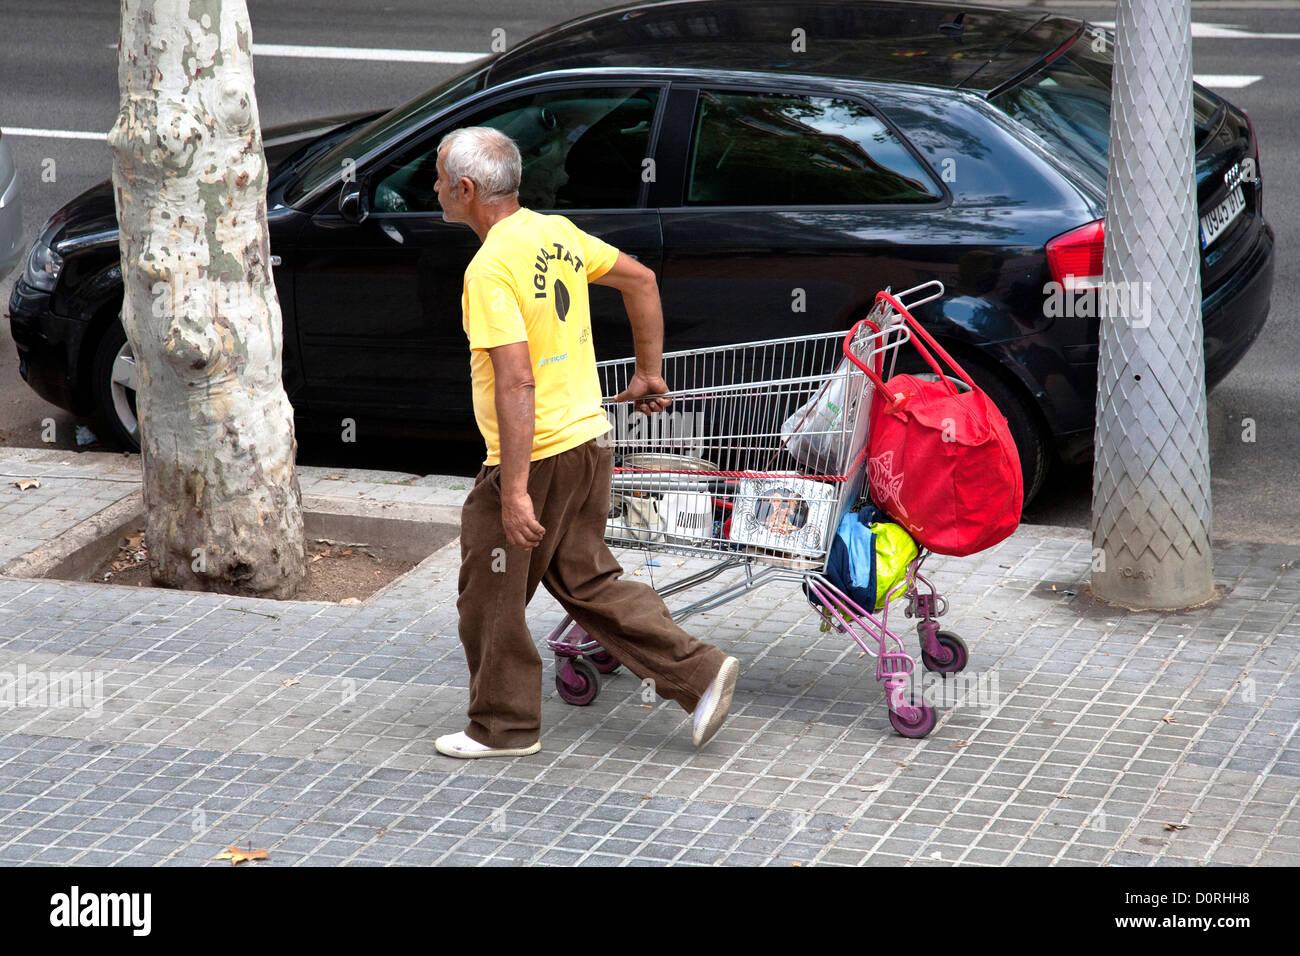 Man collecting scrap metal in supermarket trolley. - Stock Image